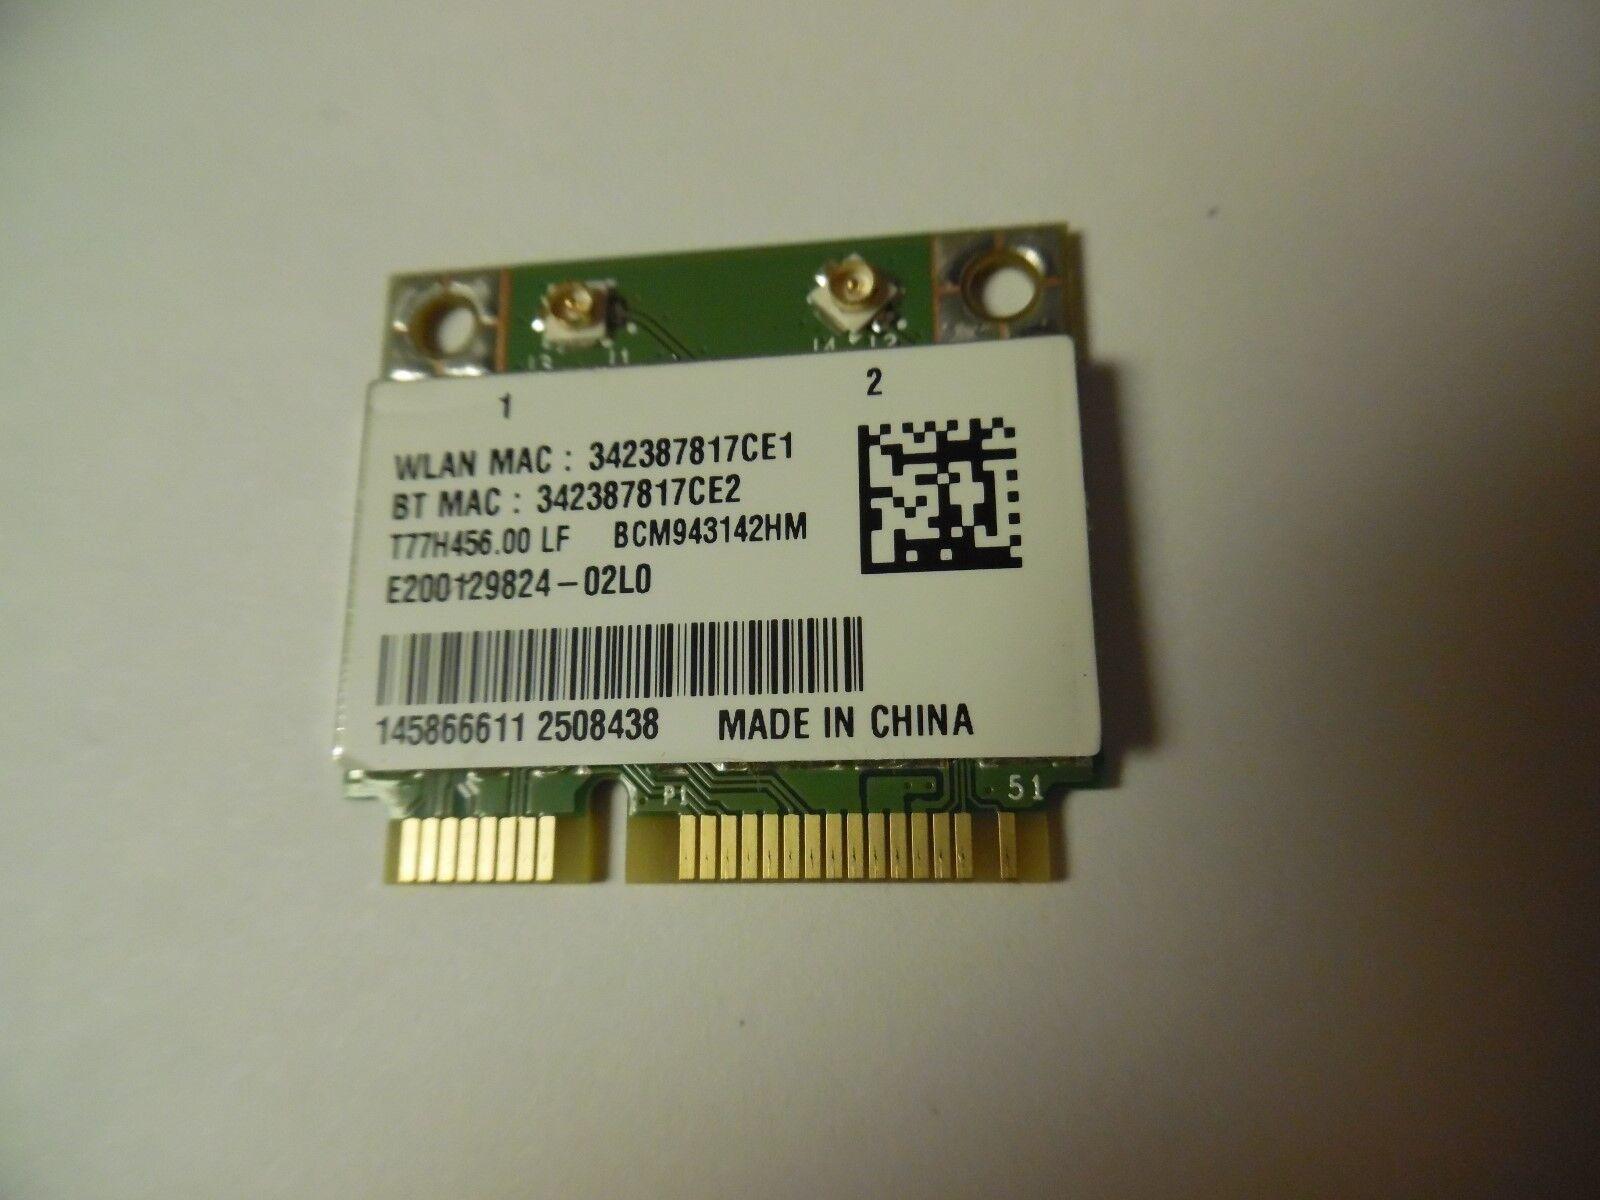 1-458-666-11 Sony Vaio SVF14 SVF15 Mini PCI-e WLAN Wireless BT Card BCM943142HM